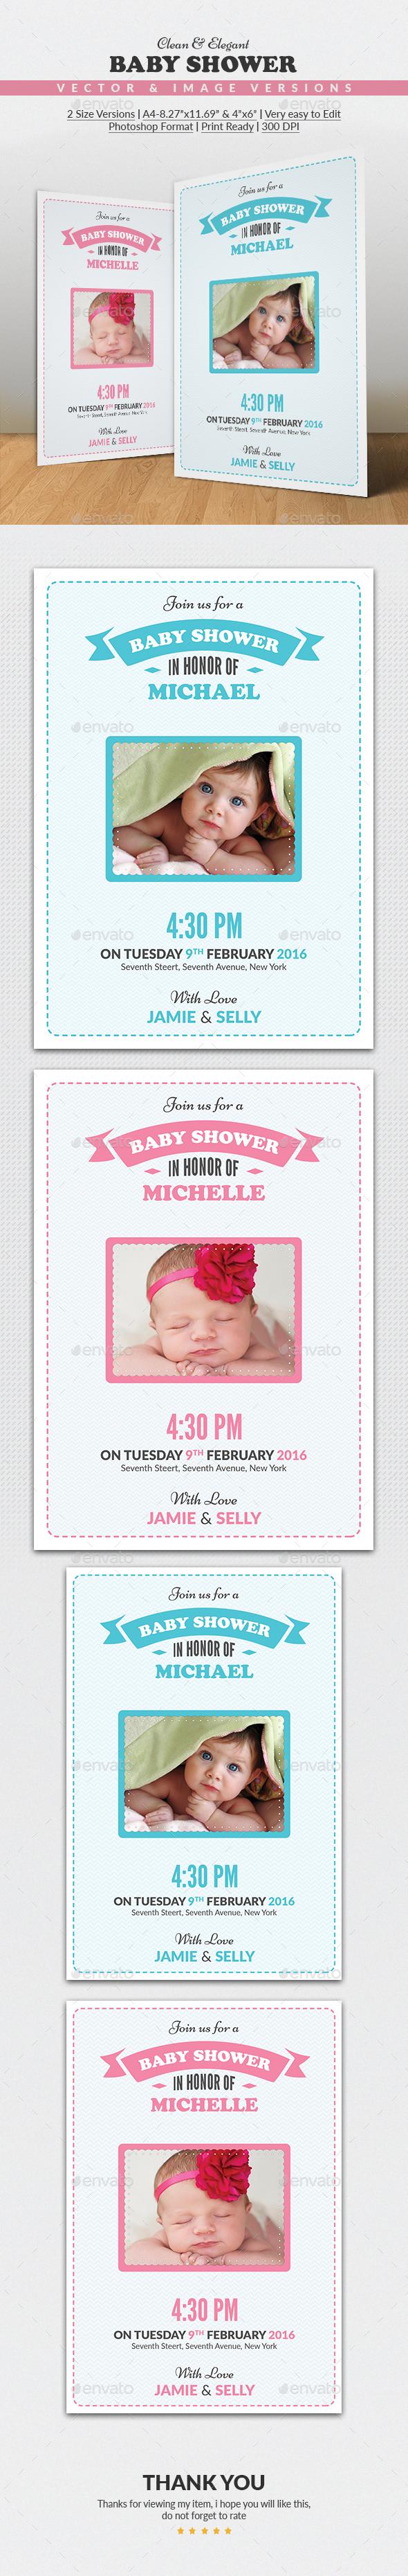 Baby Shower Invitation Card - Invitations Cards & Invites